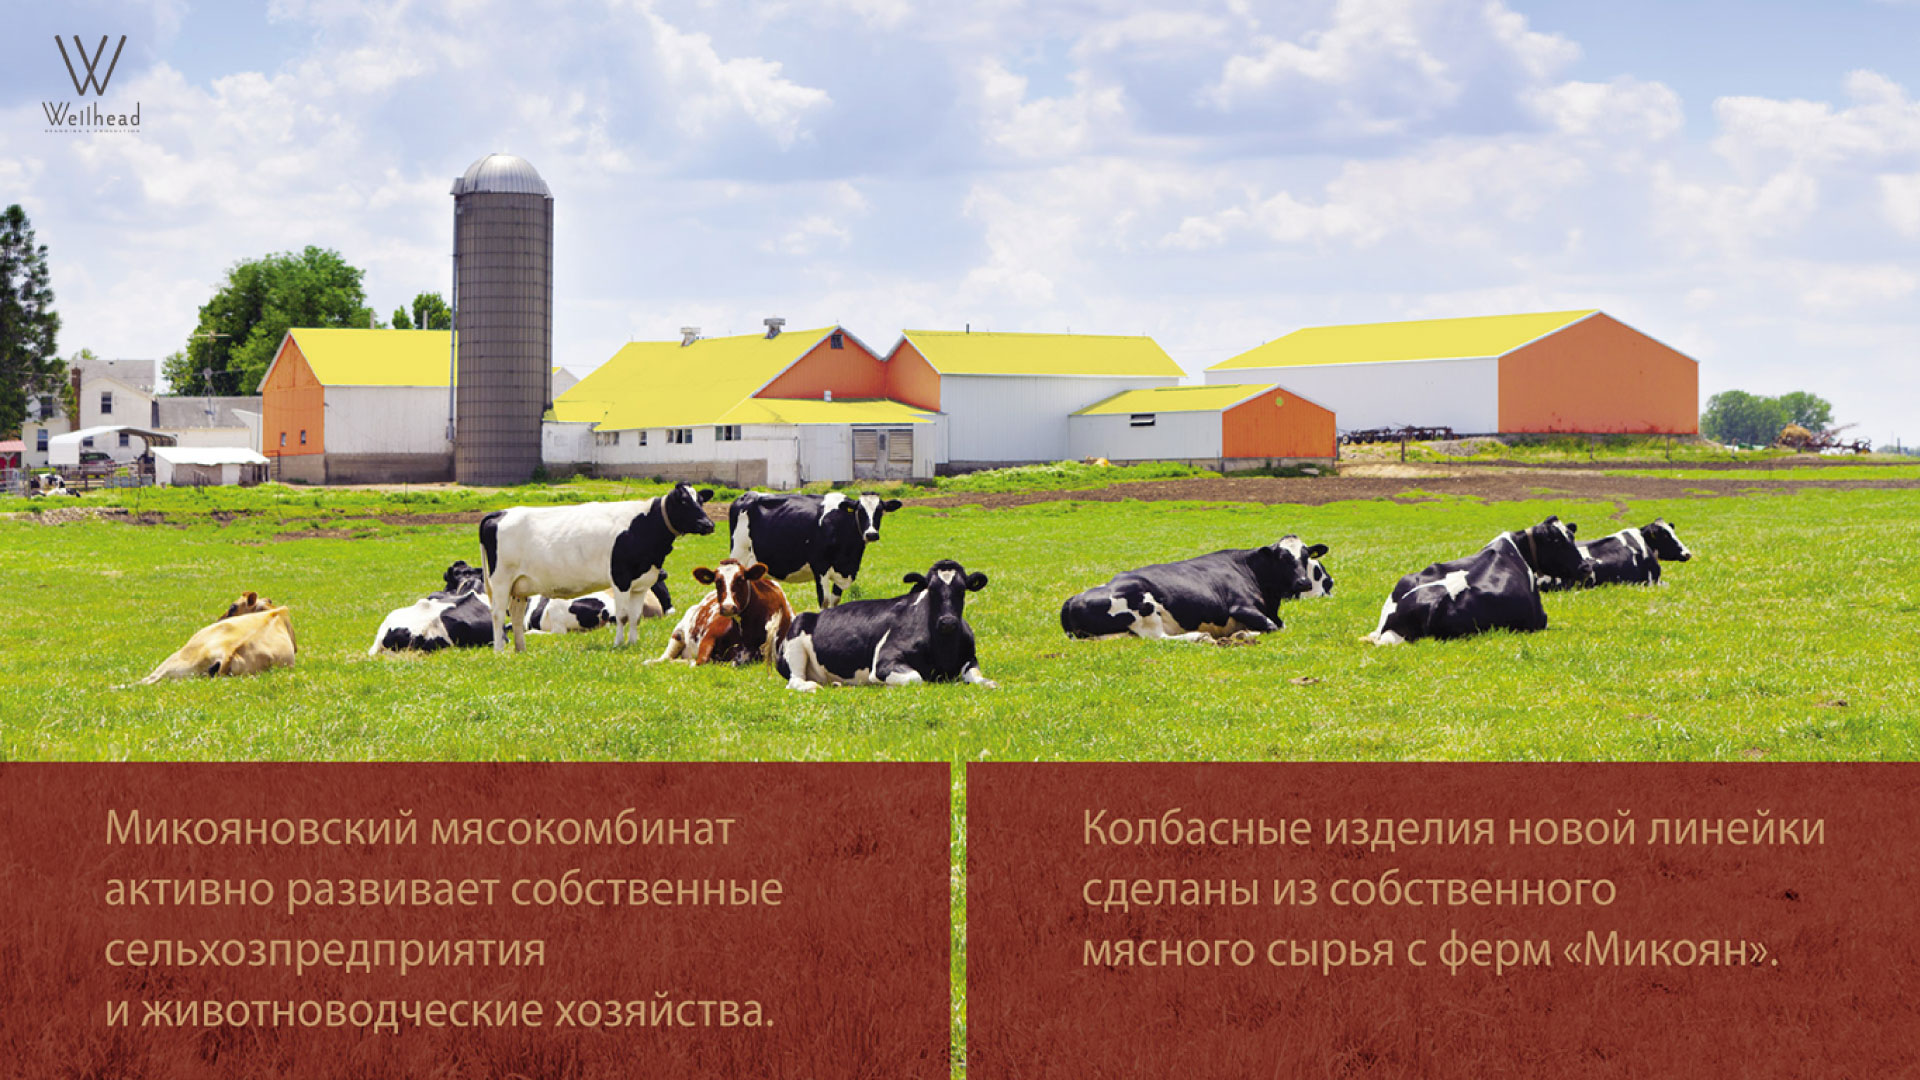 Новый бренд для Микояновского мясокомбината